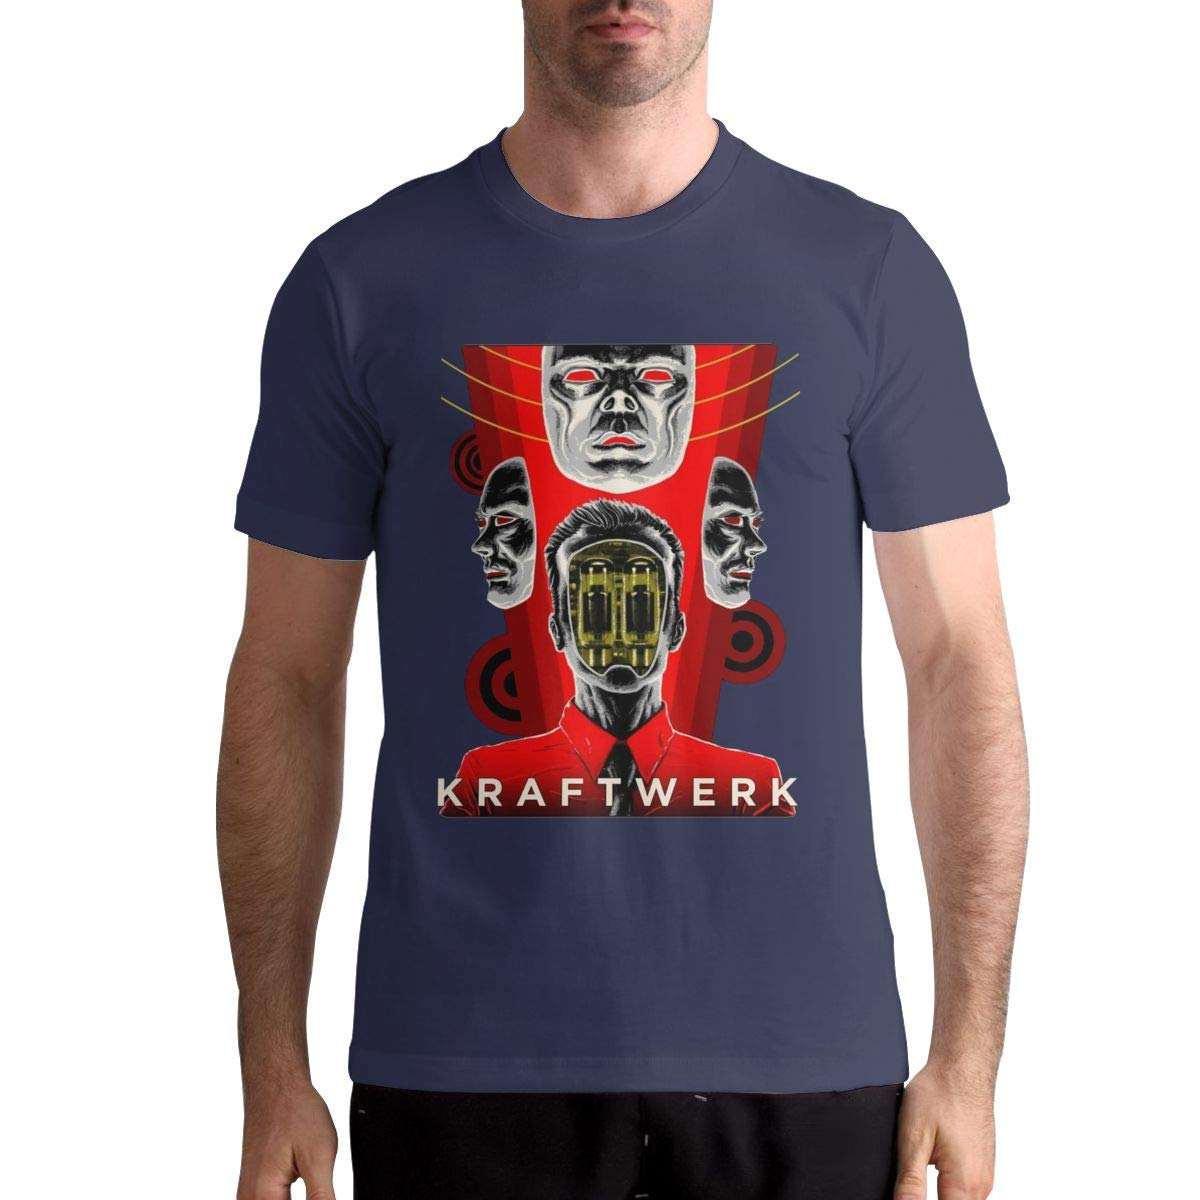 ThomasSThoms Men/â/€/™s Kraftwerk Graphic Printing T Shirt for Summer Casual Short Sleeve T-Shirt